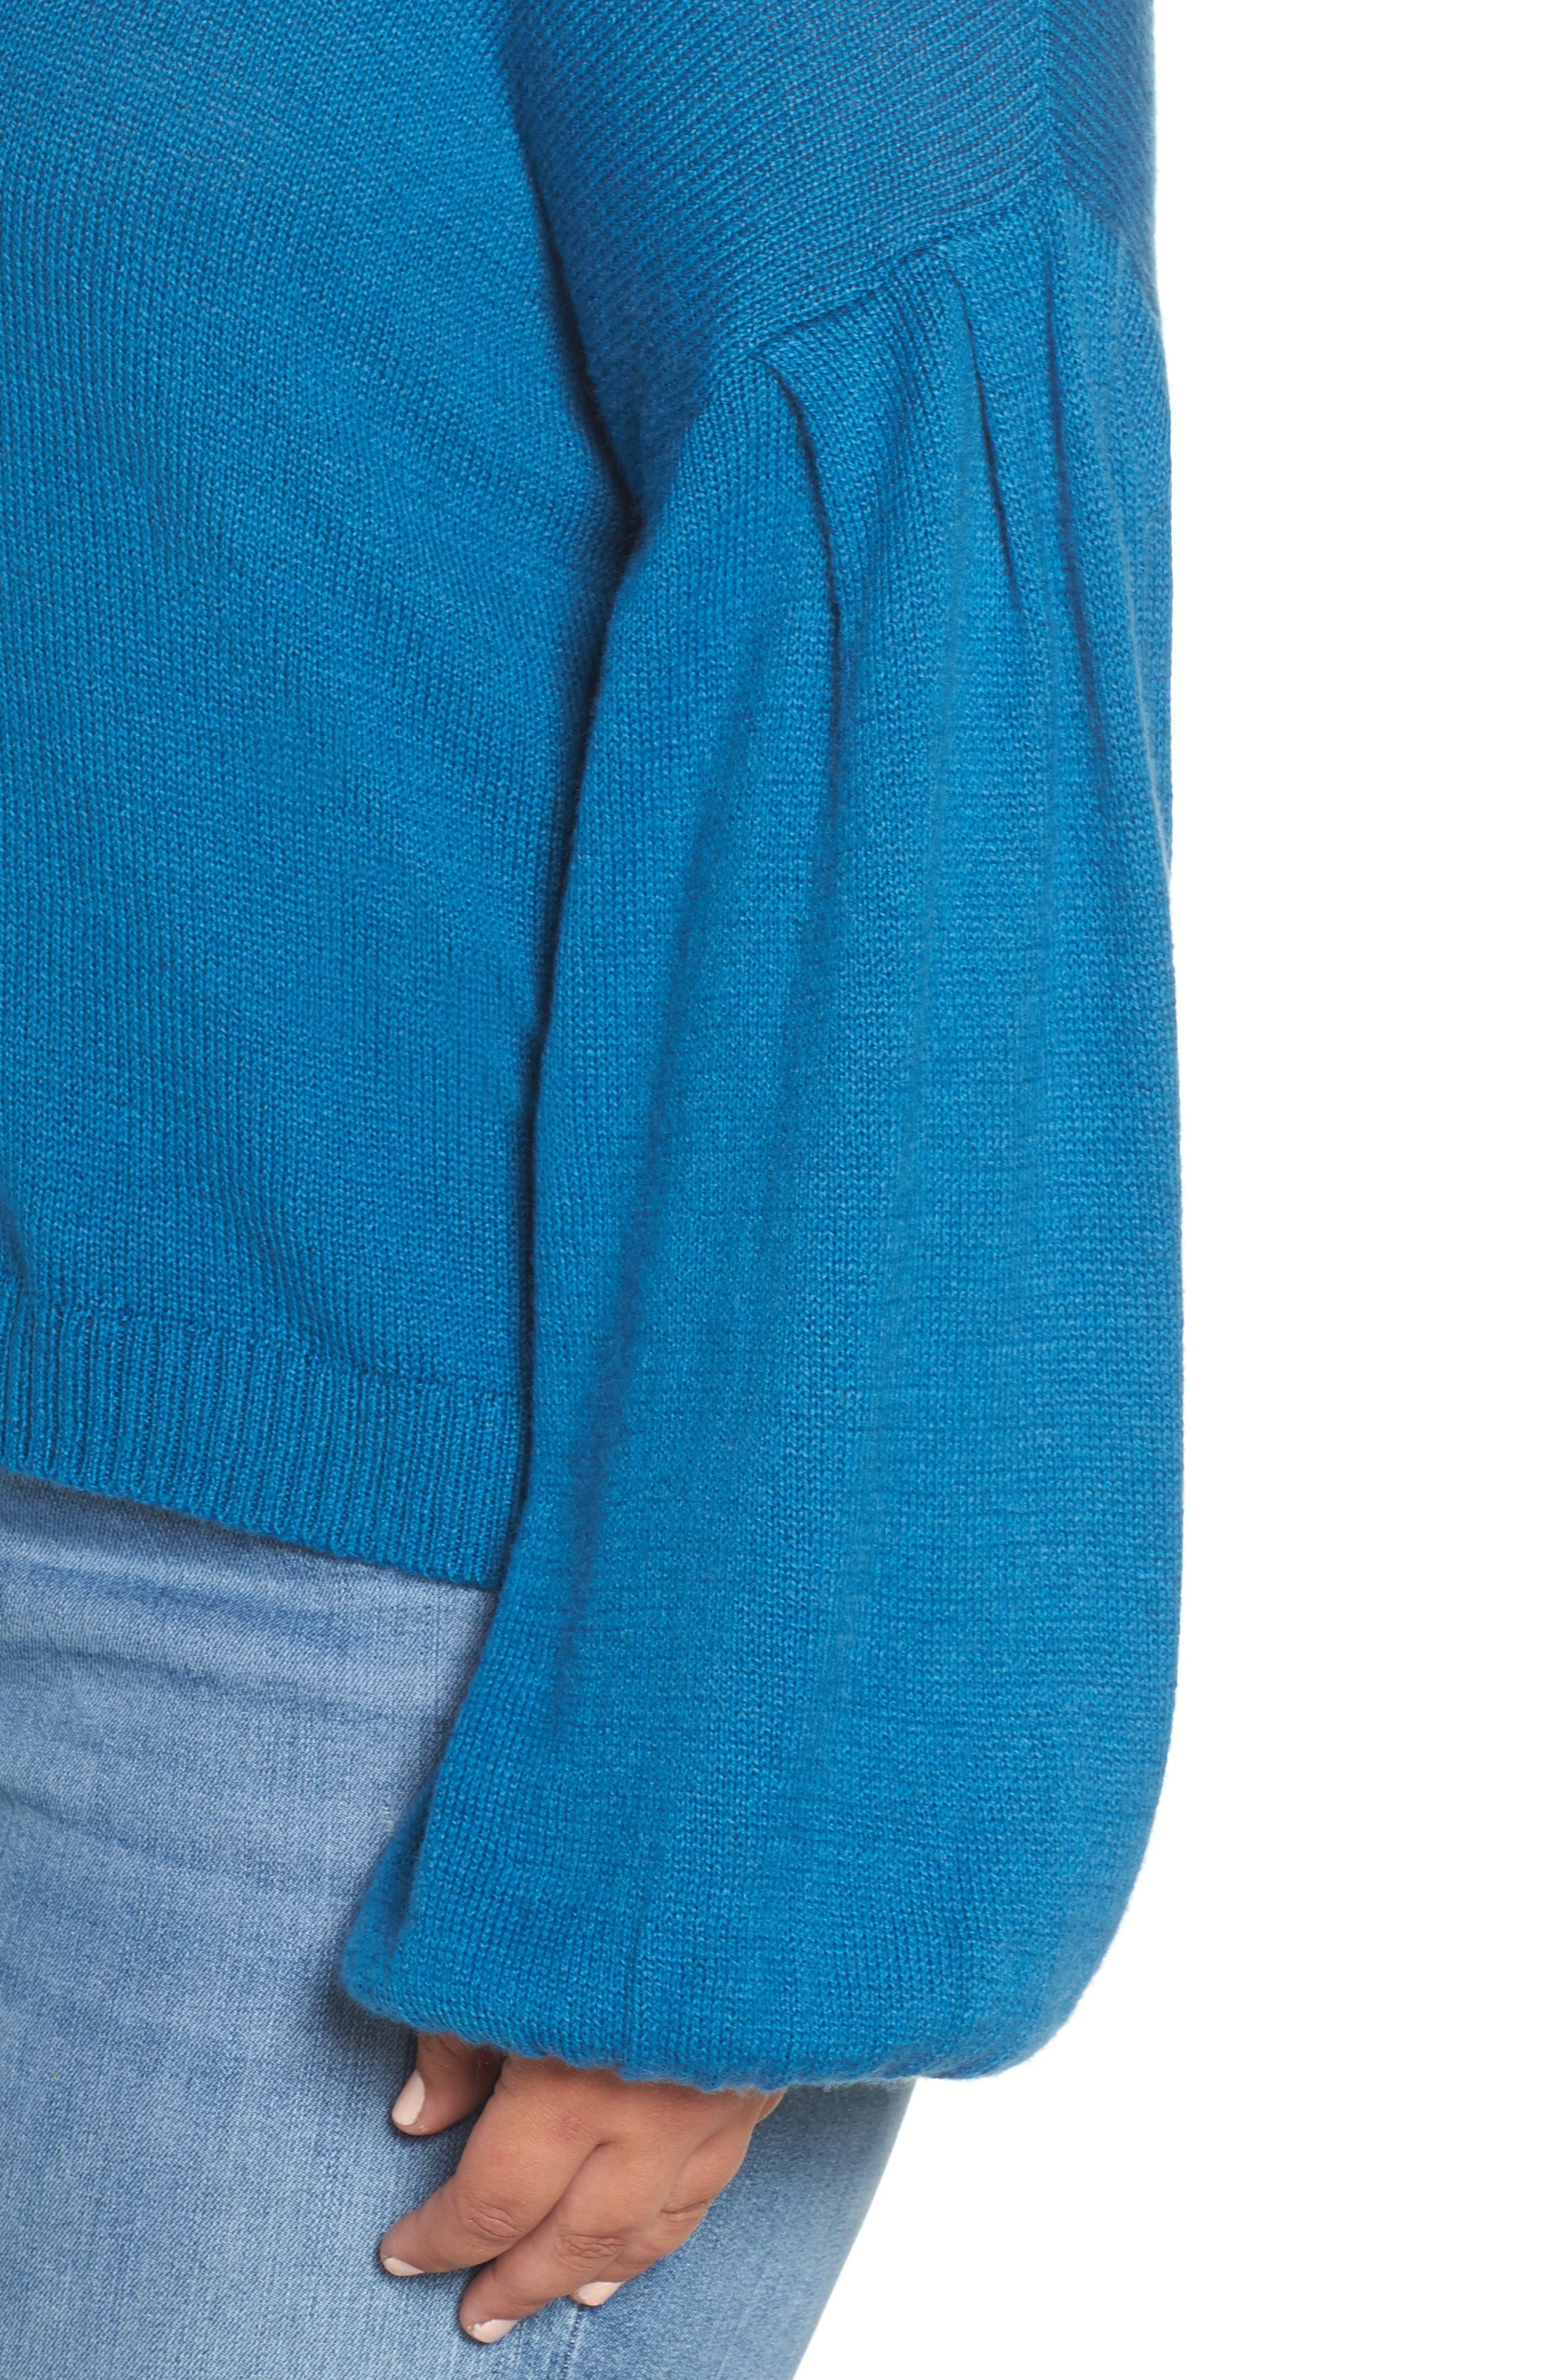 Blouson Sleeve Sweater,                             Alternate thumbnail 10, color,                             TEAL SAPPHIRE